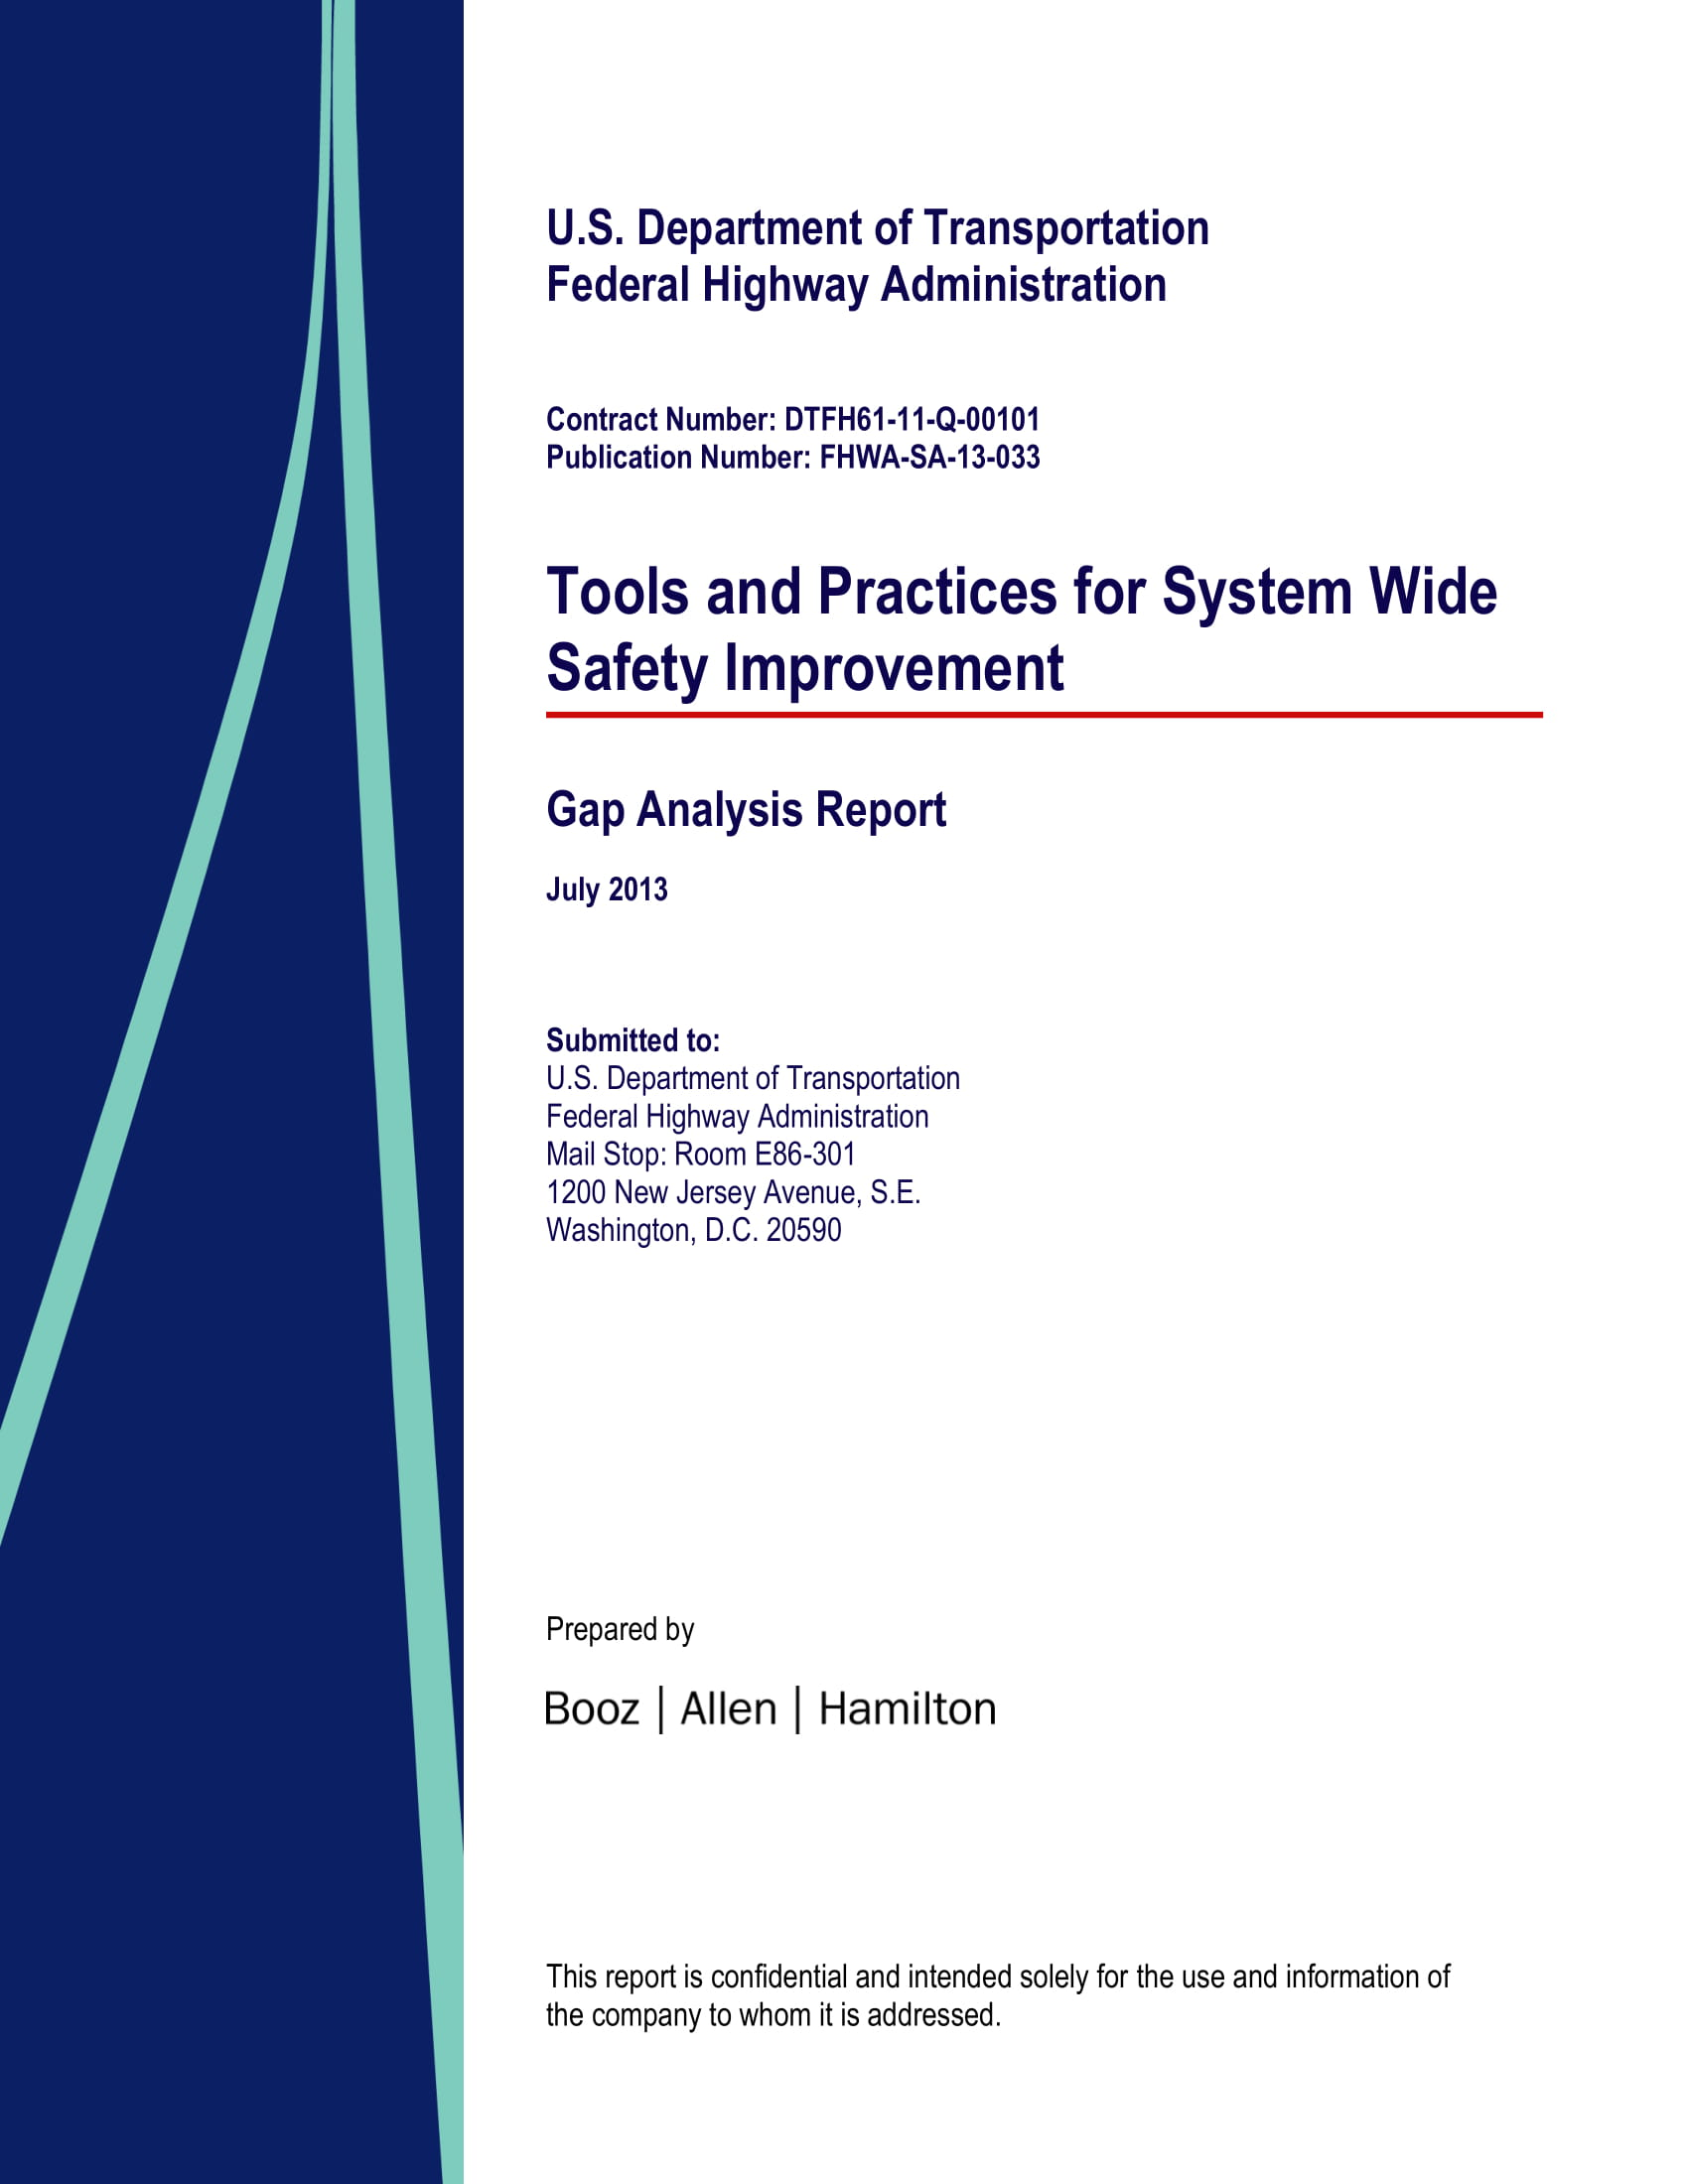 simple gap analysis report example 01